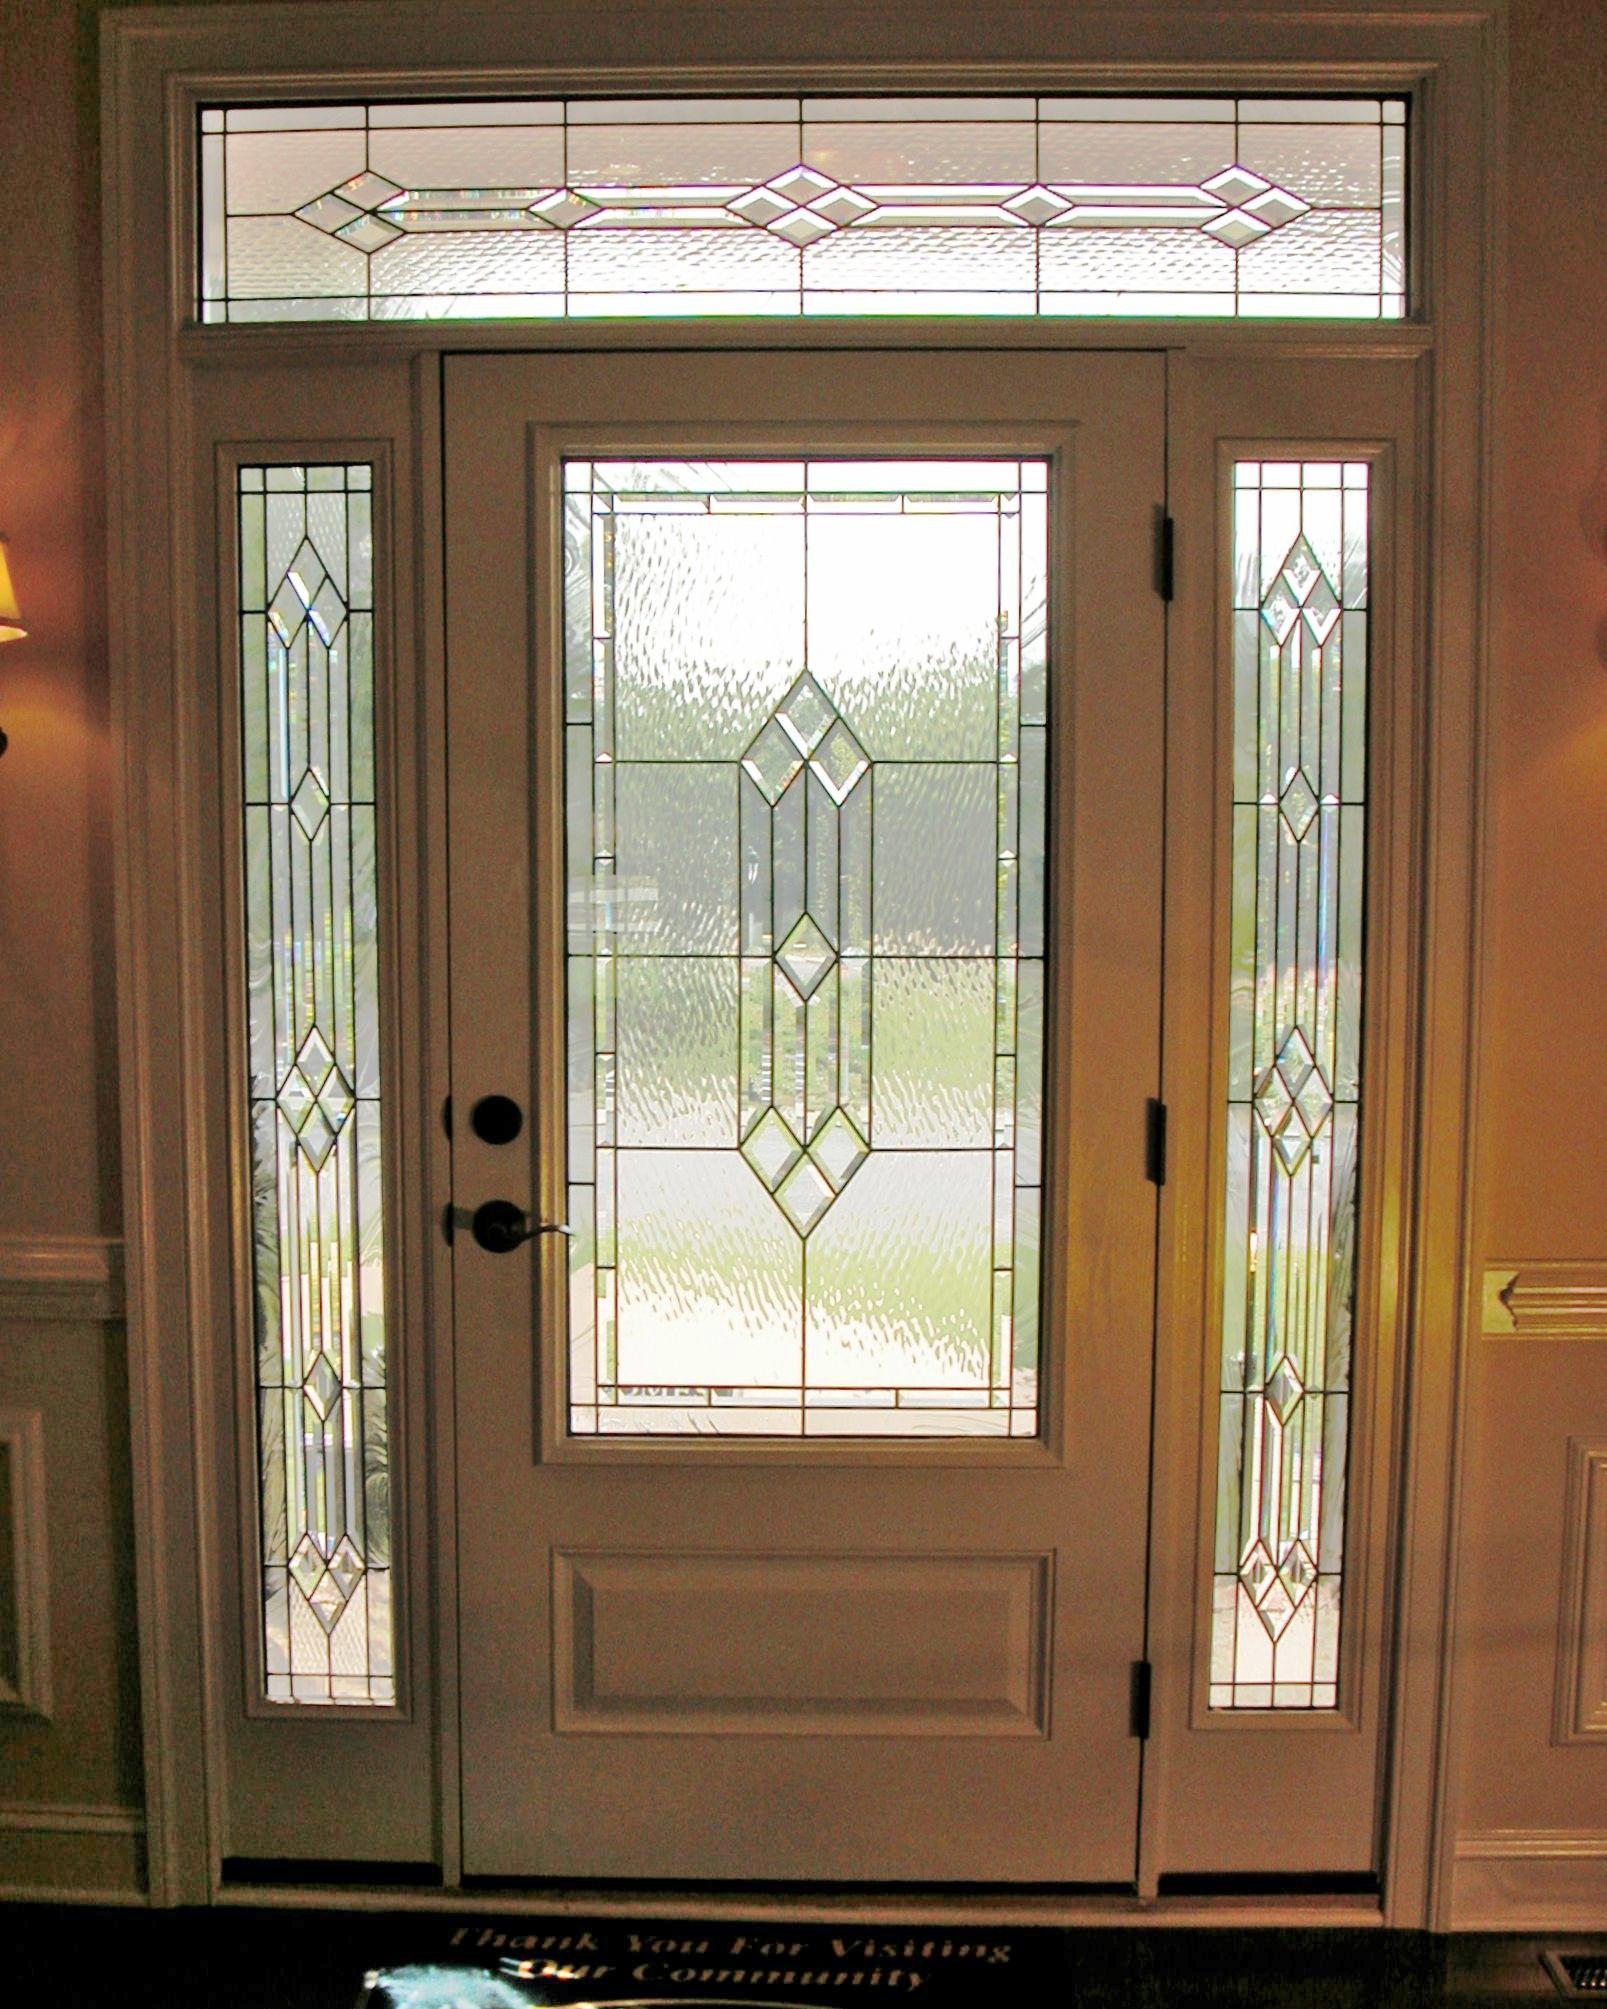 Hunton Design Stainedglass Door Custom Made Beautiful Classy Privacy Beveled Artsy Elegant Leaded Glass Door Beveled Glass Doors Door Glass Design